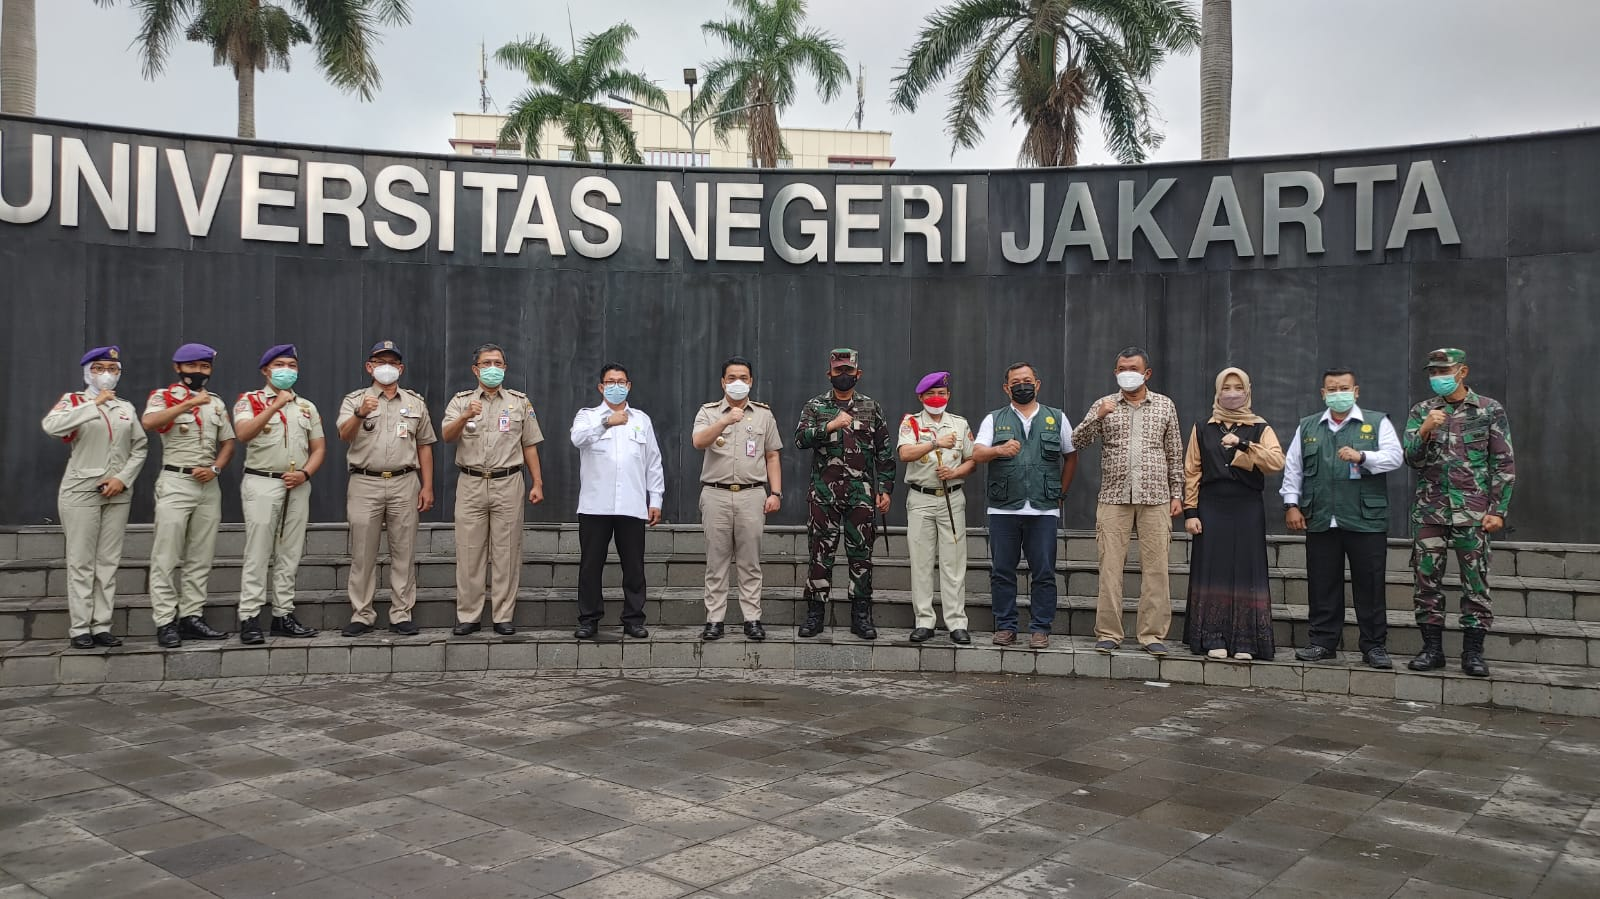 Resimen Mahasiswa UNJ bersama Kodam Jaya Gelar Vaksinasi Massal, Riza Patria : Semoga Memepercepat Health Immunity Masyarakat, dan Target Vaksinasi DKI Jakarta Bisa Tercapai